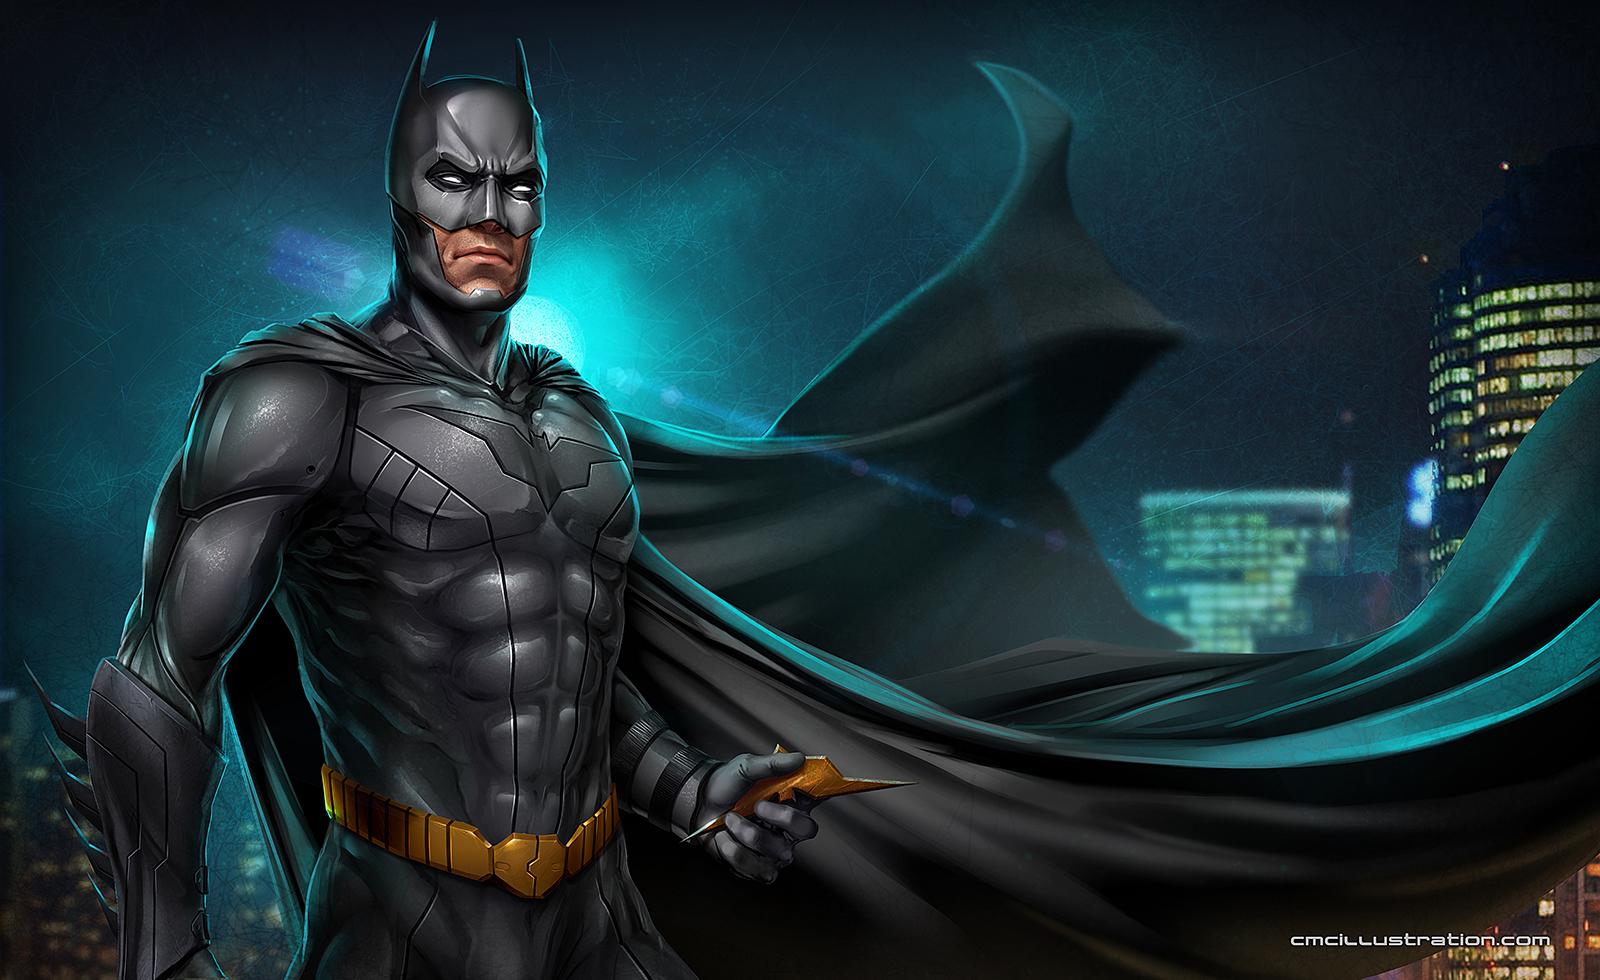 Batman New 52 Wallpaper - WallpaperSafariNew 52 Batman Beyond